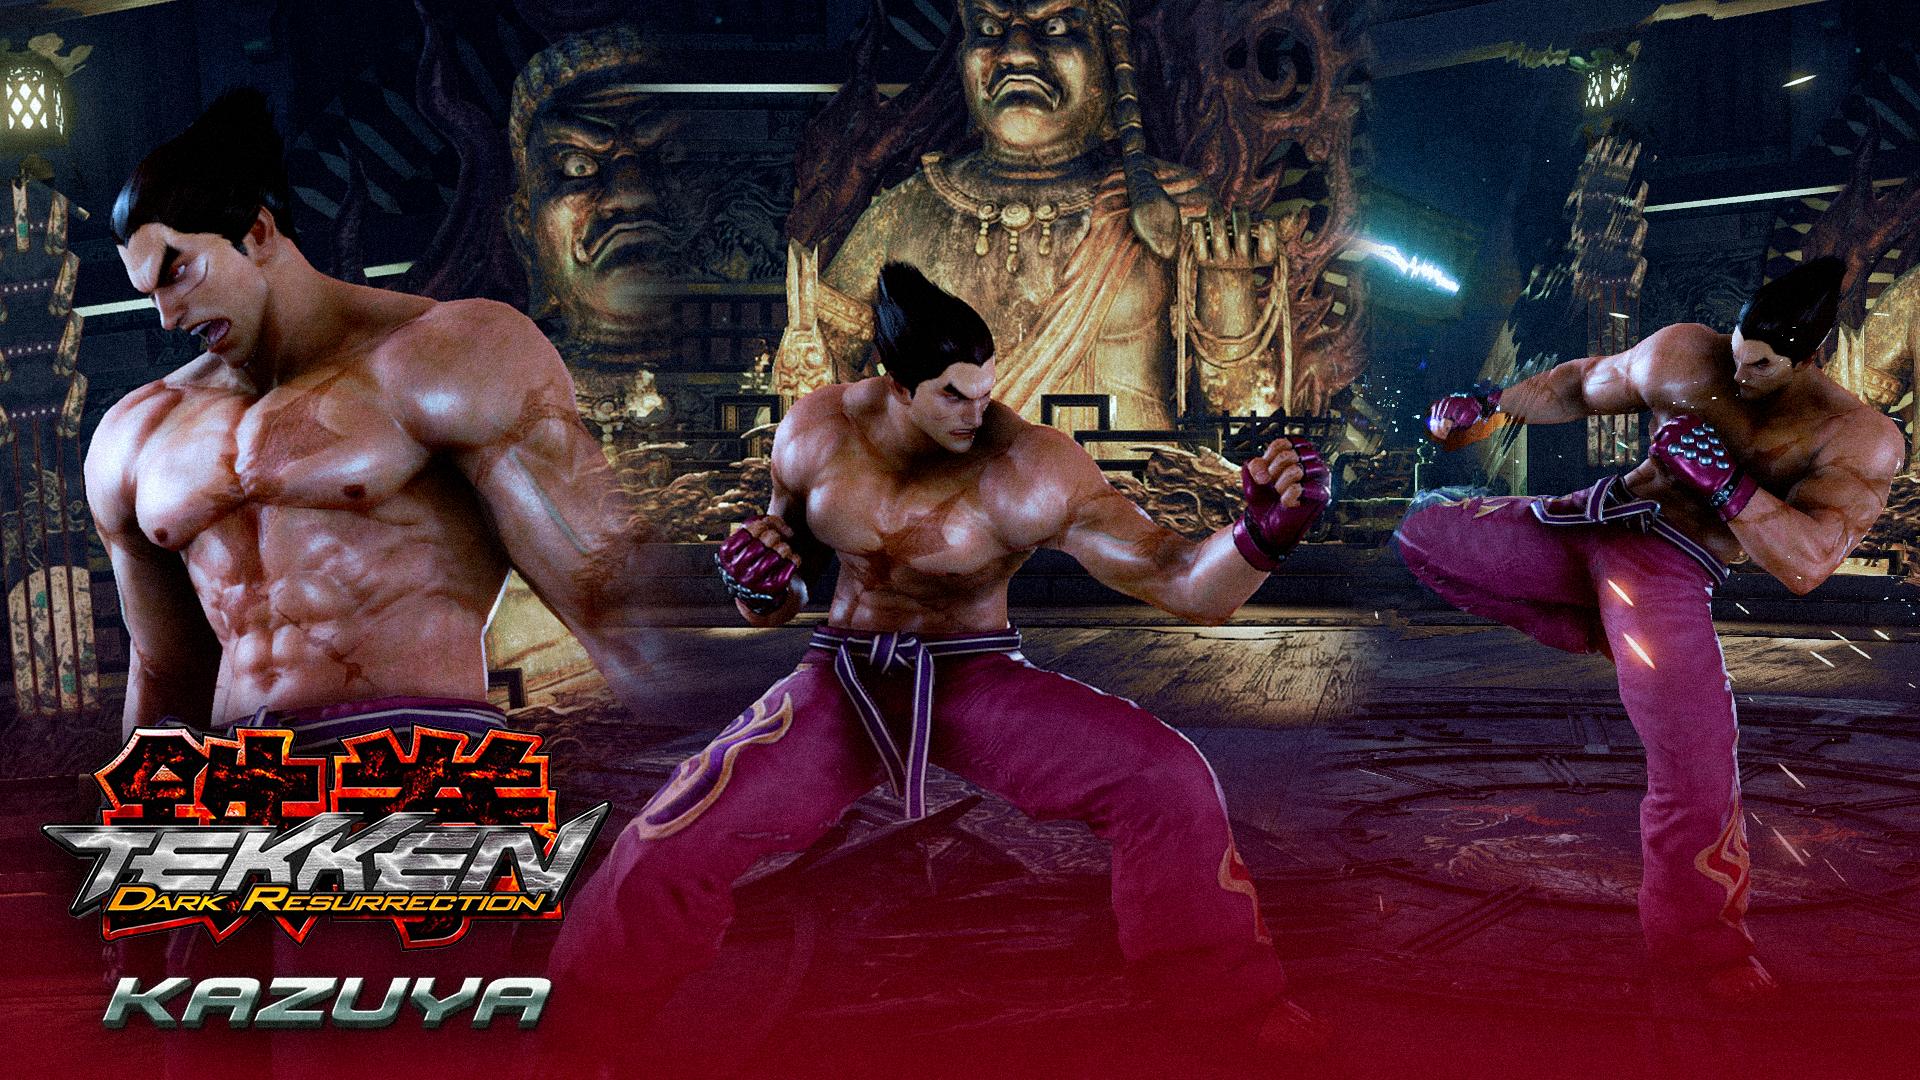 Tekken Dark Resurrection Kazuya Mishima By Mattplara On Deviantart